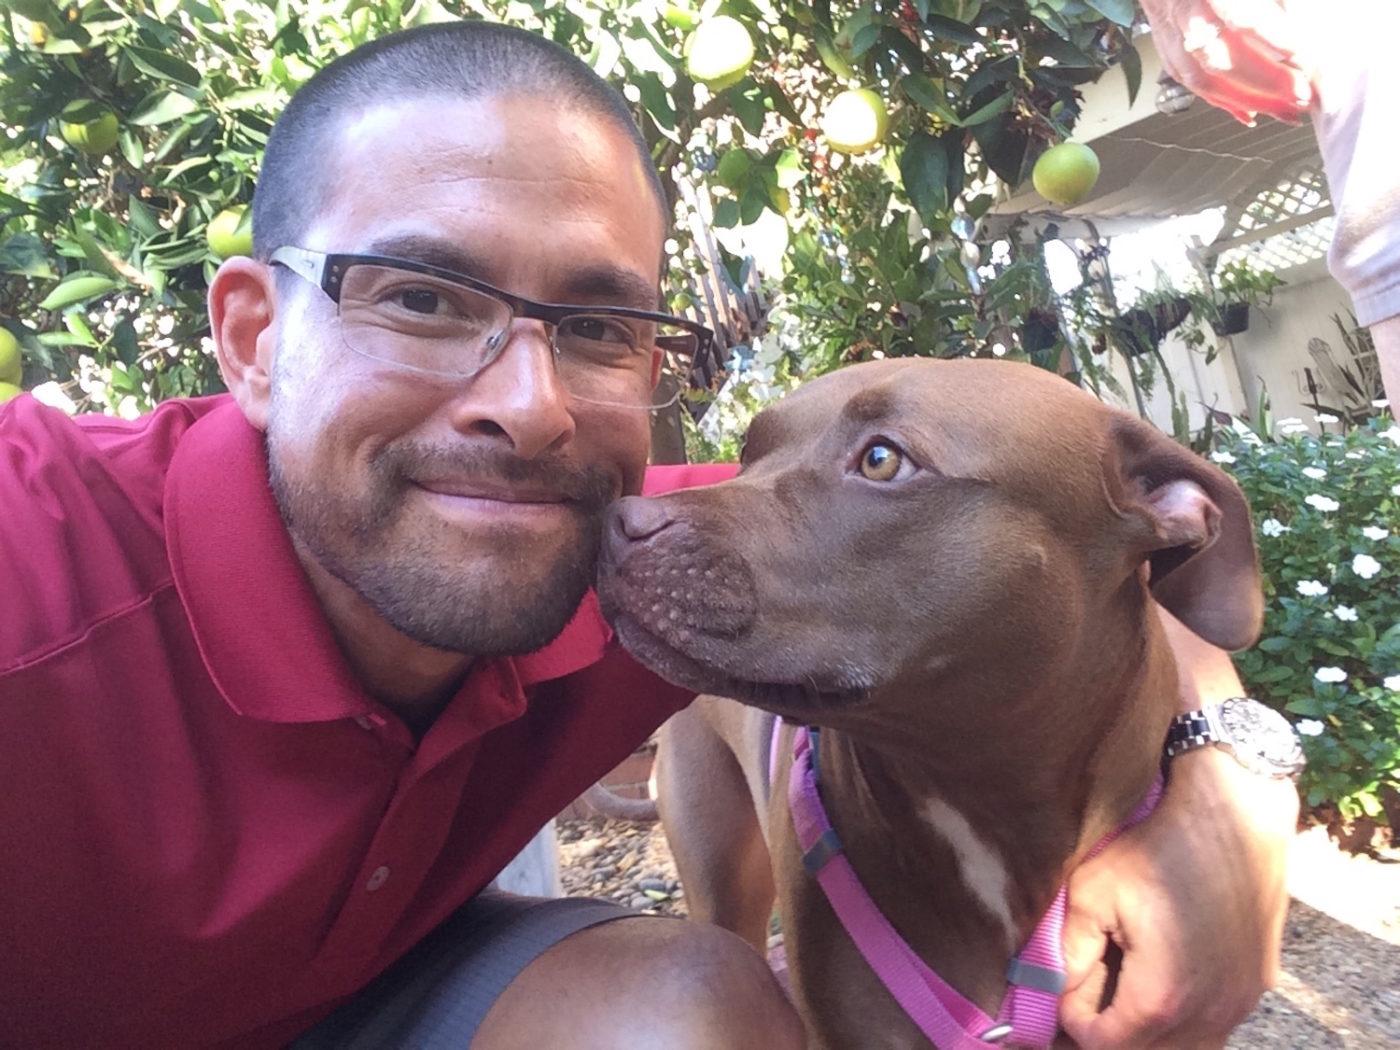 #cutedogs, #dogsofbarkbusters, #barkbusterssandiego, #sandiegodogs